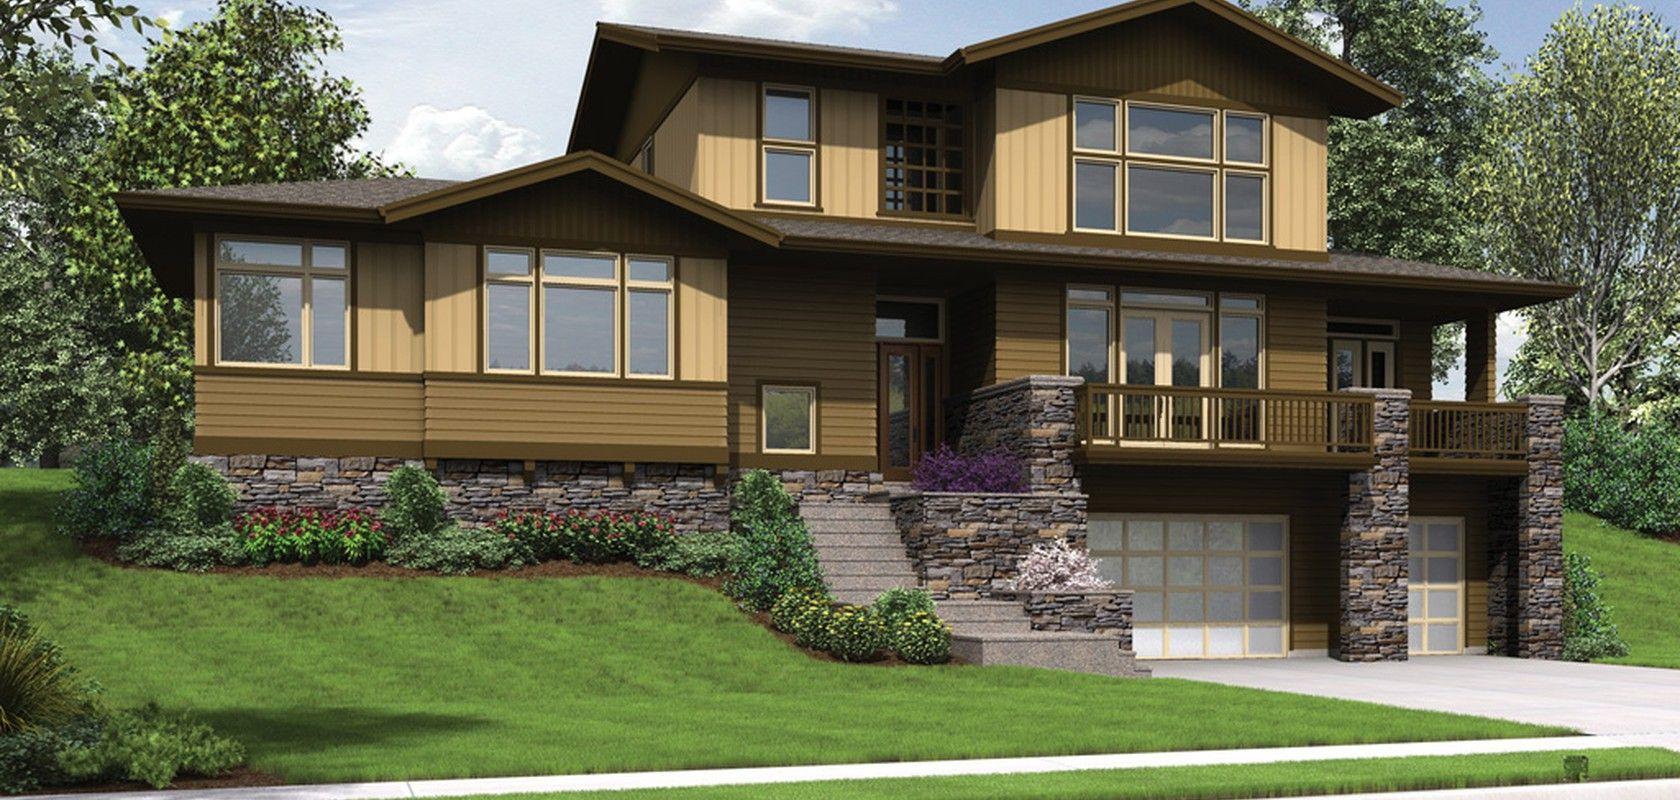 Mascord House Plan 22197 The Renicker Modern style